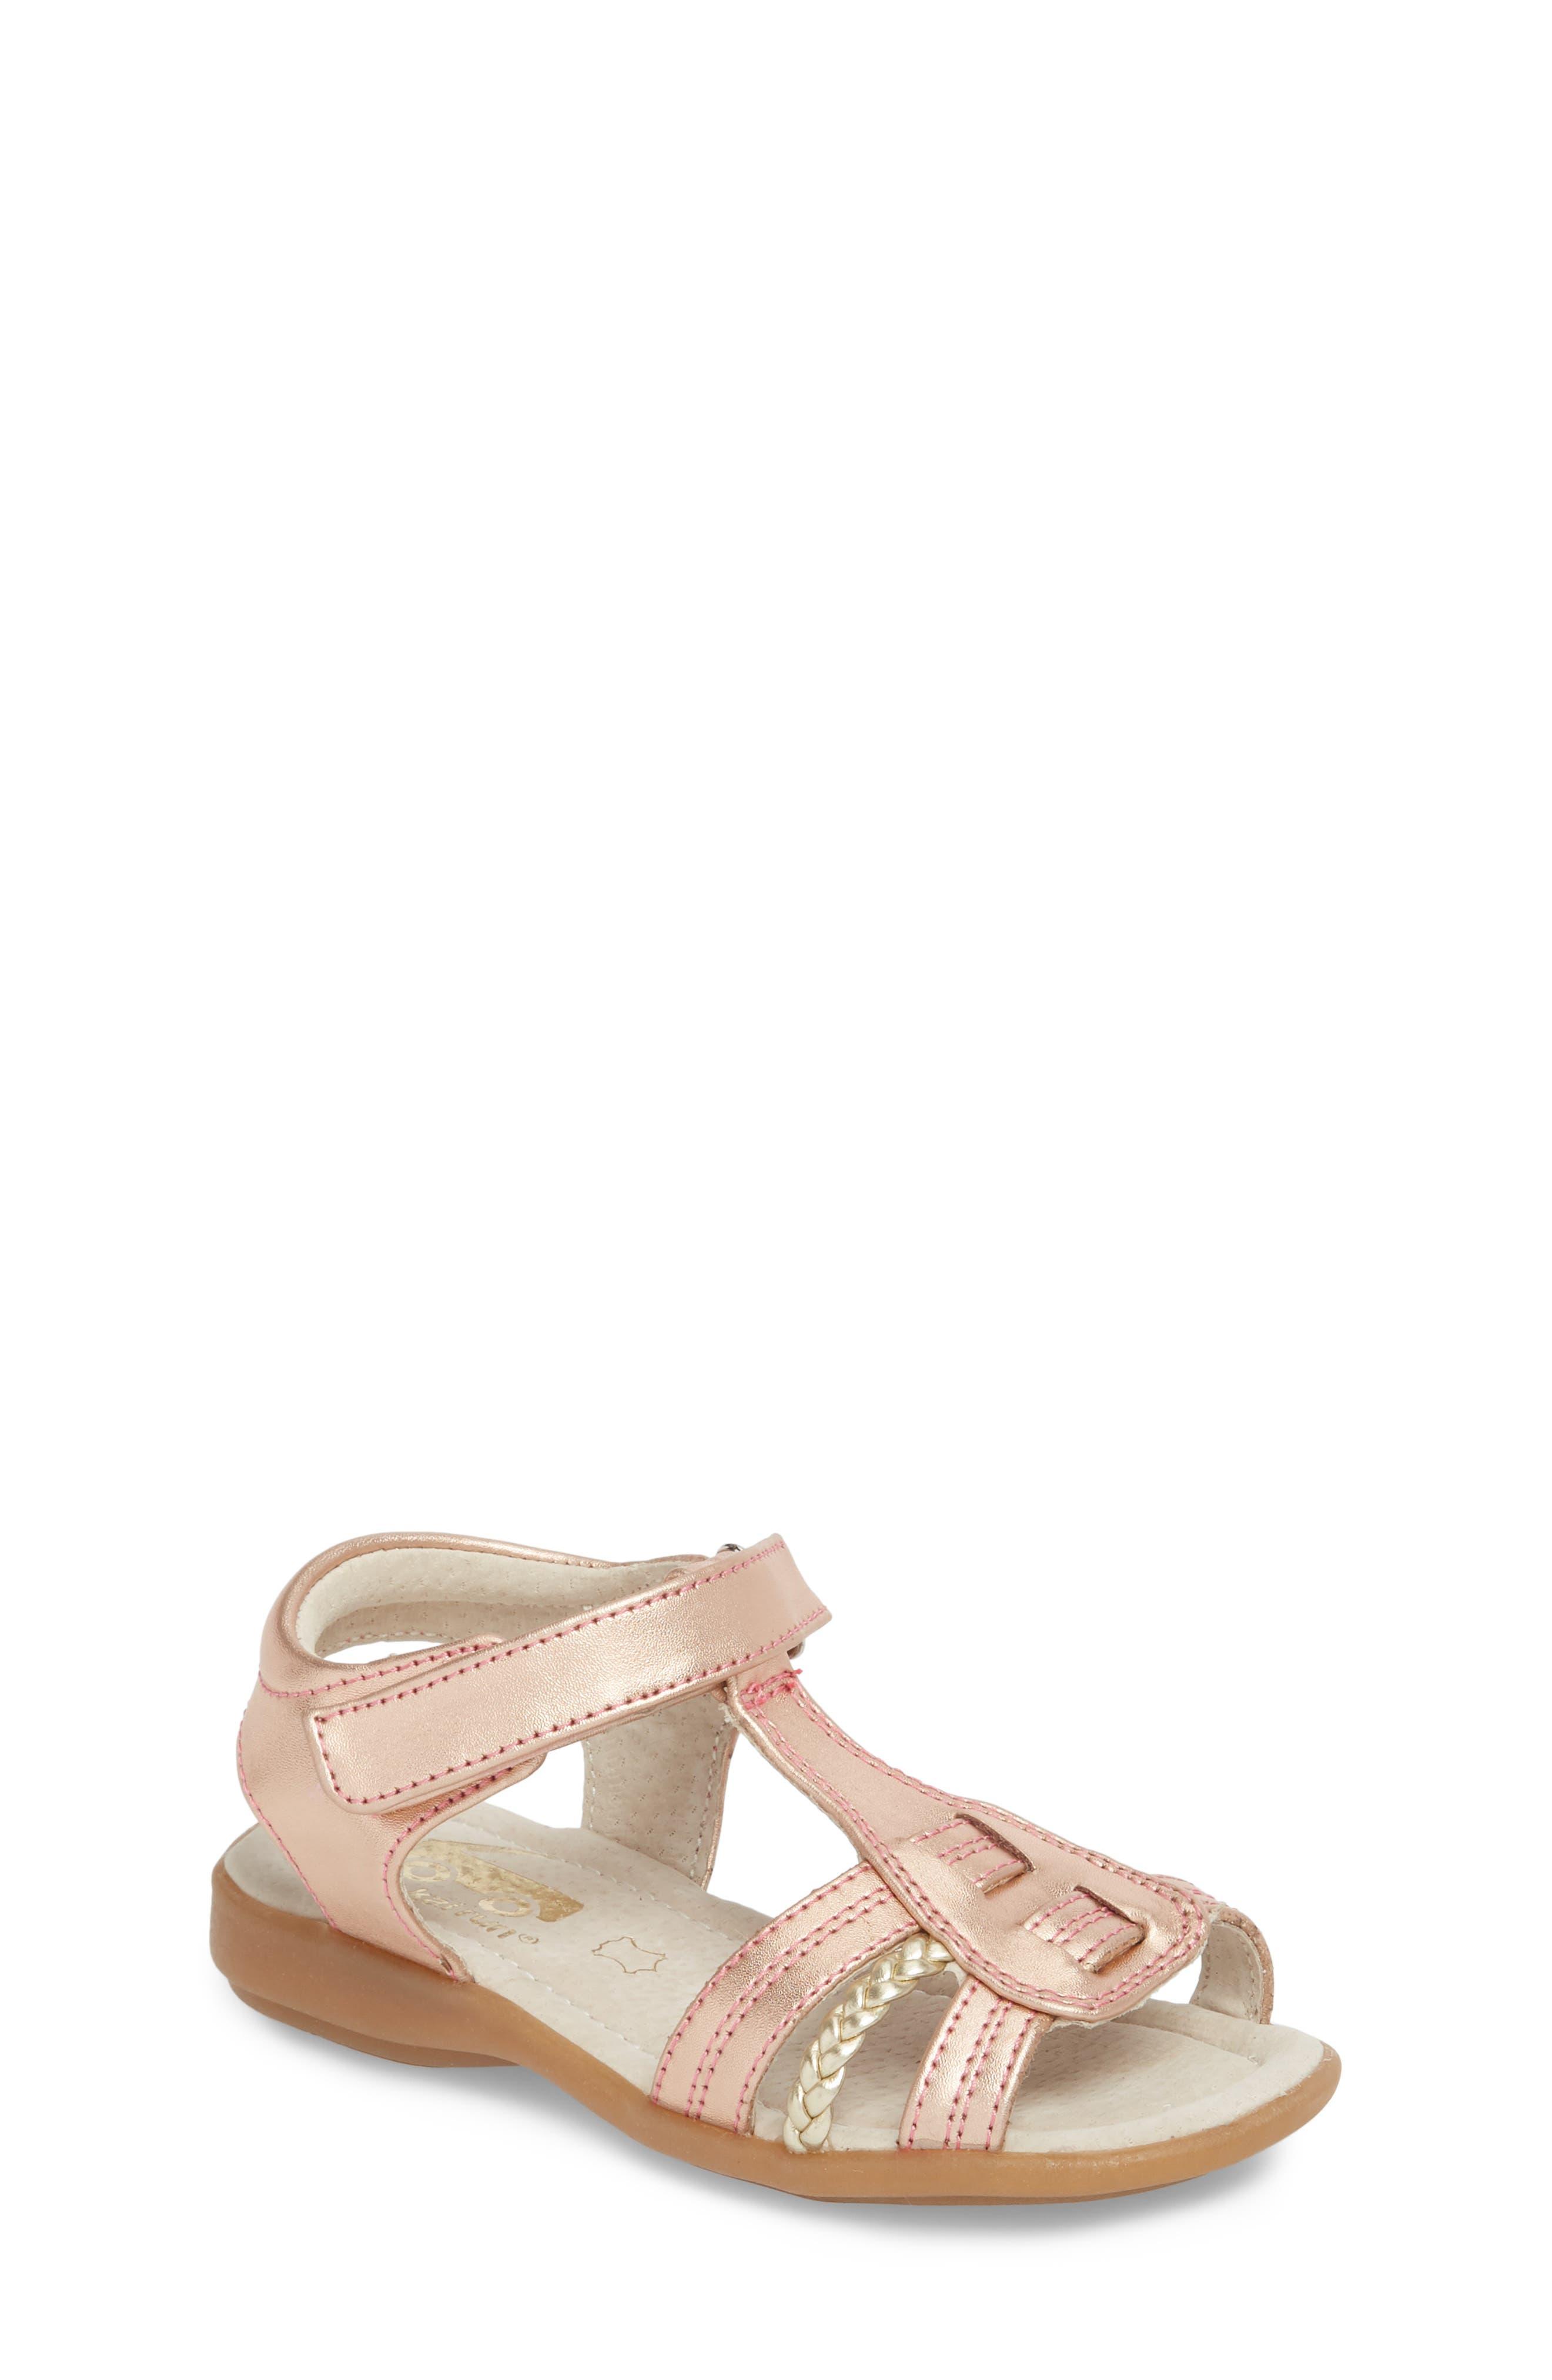 Hadley Metallic Sandal,                         Main,                         color, 040